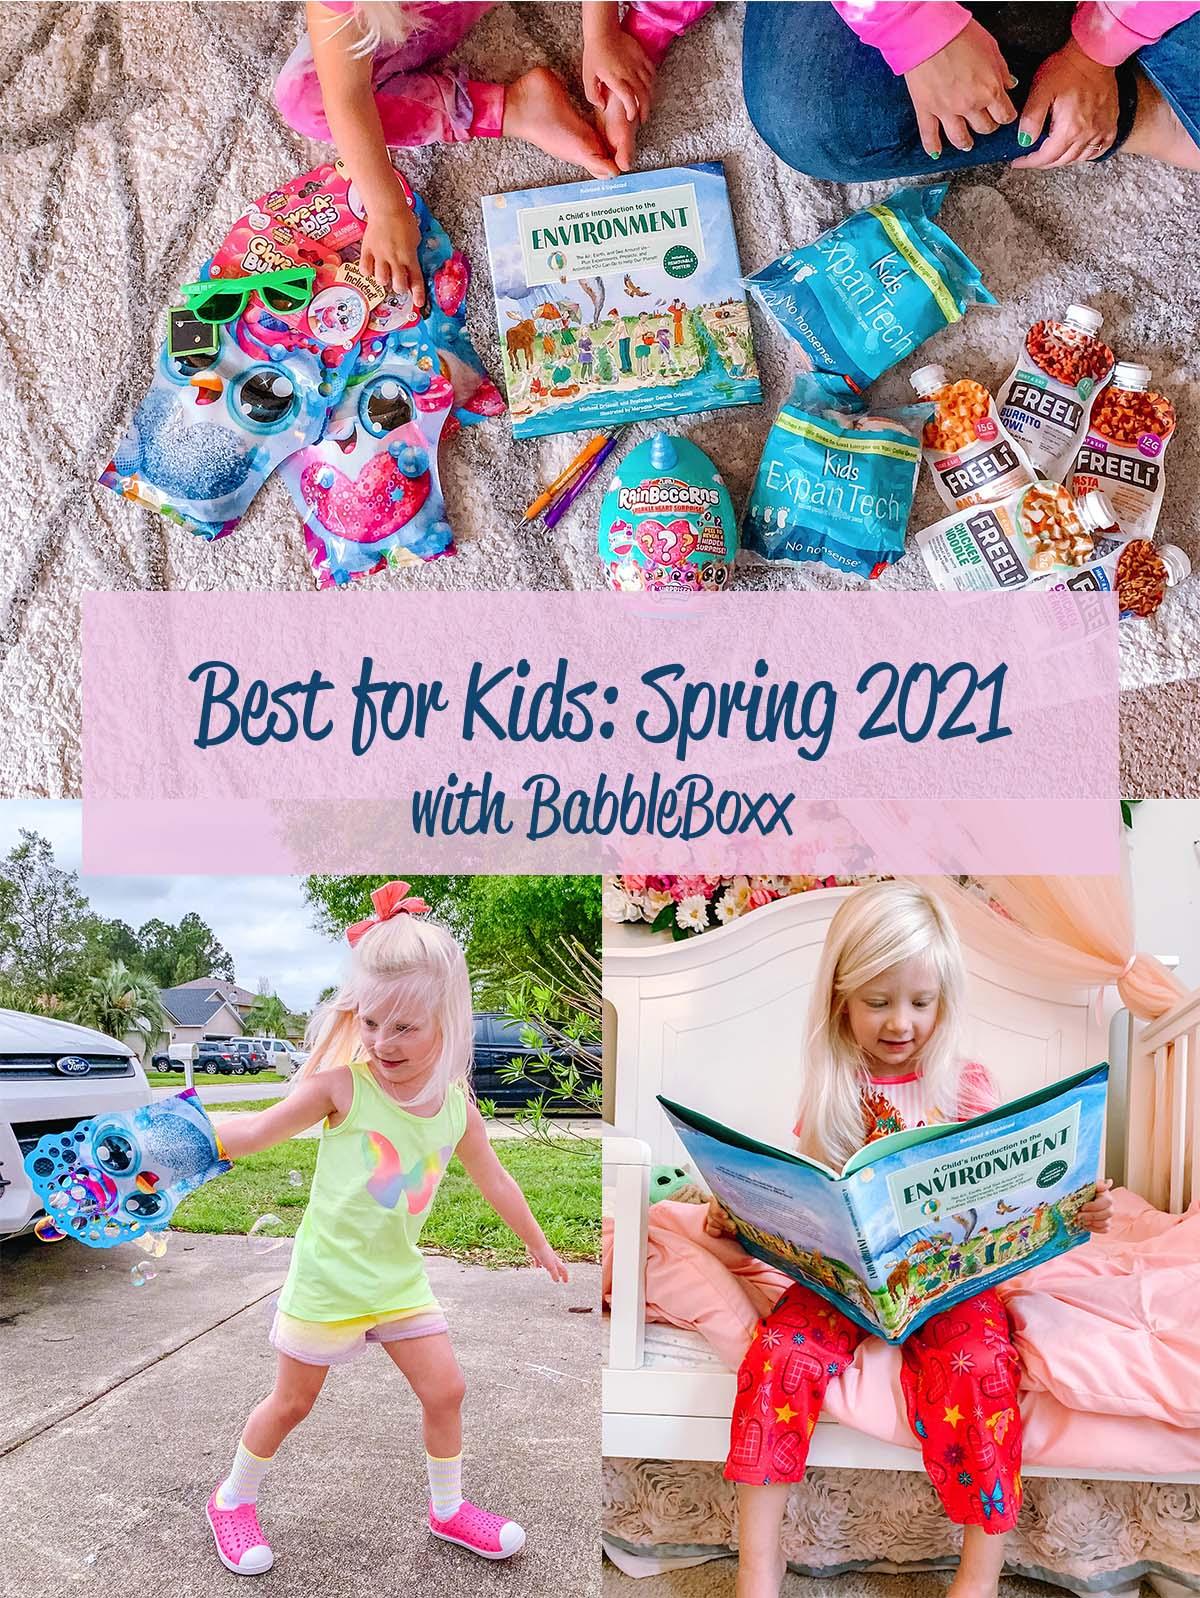 Spring Items for Kids: Inside + Outside Fun